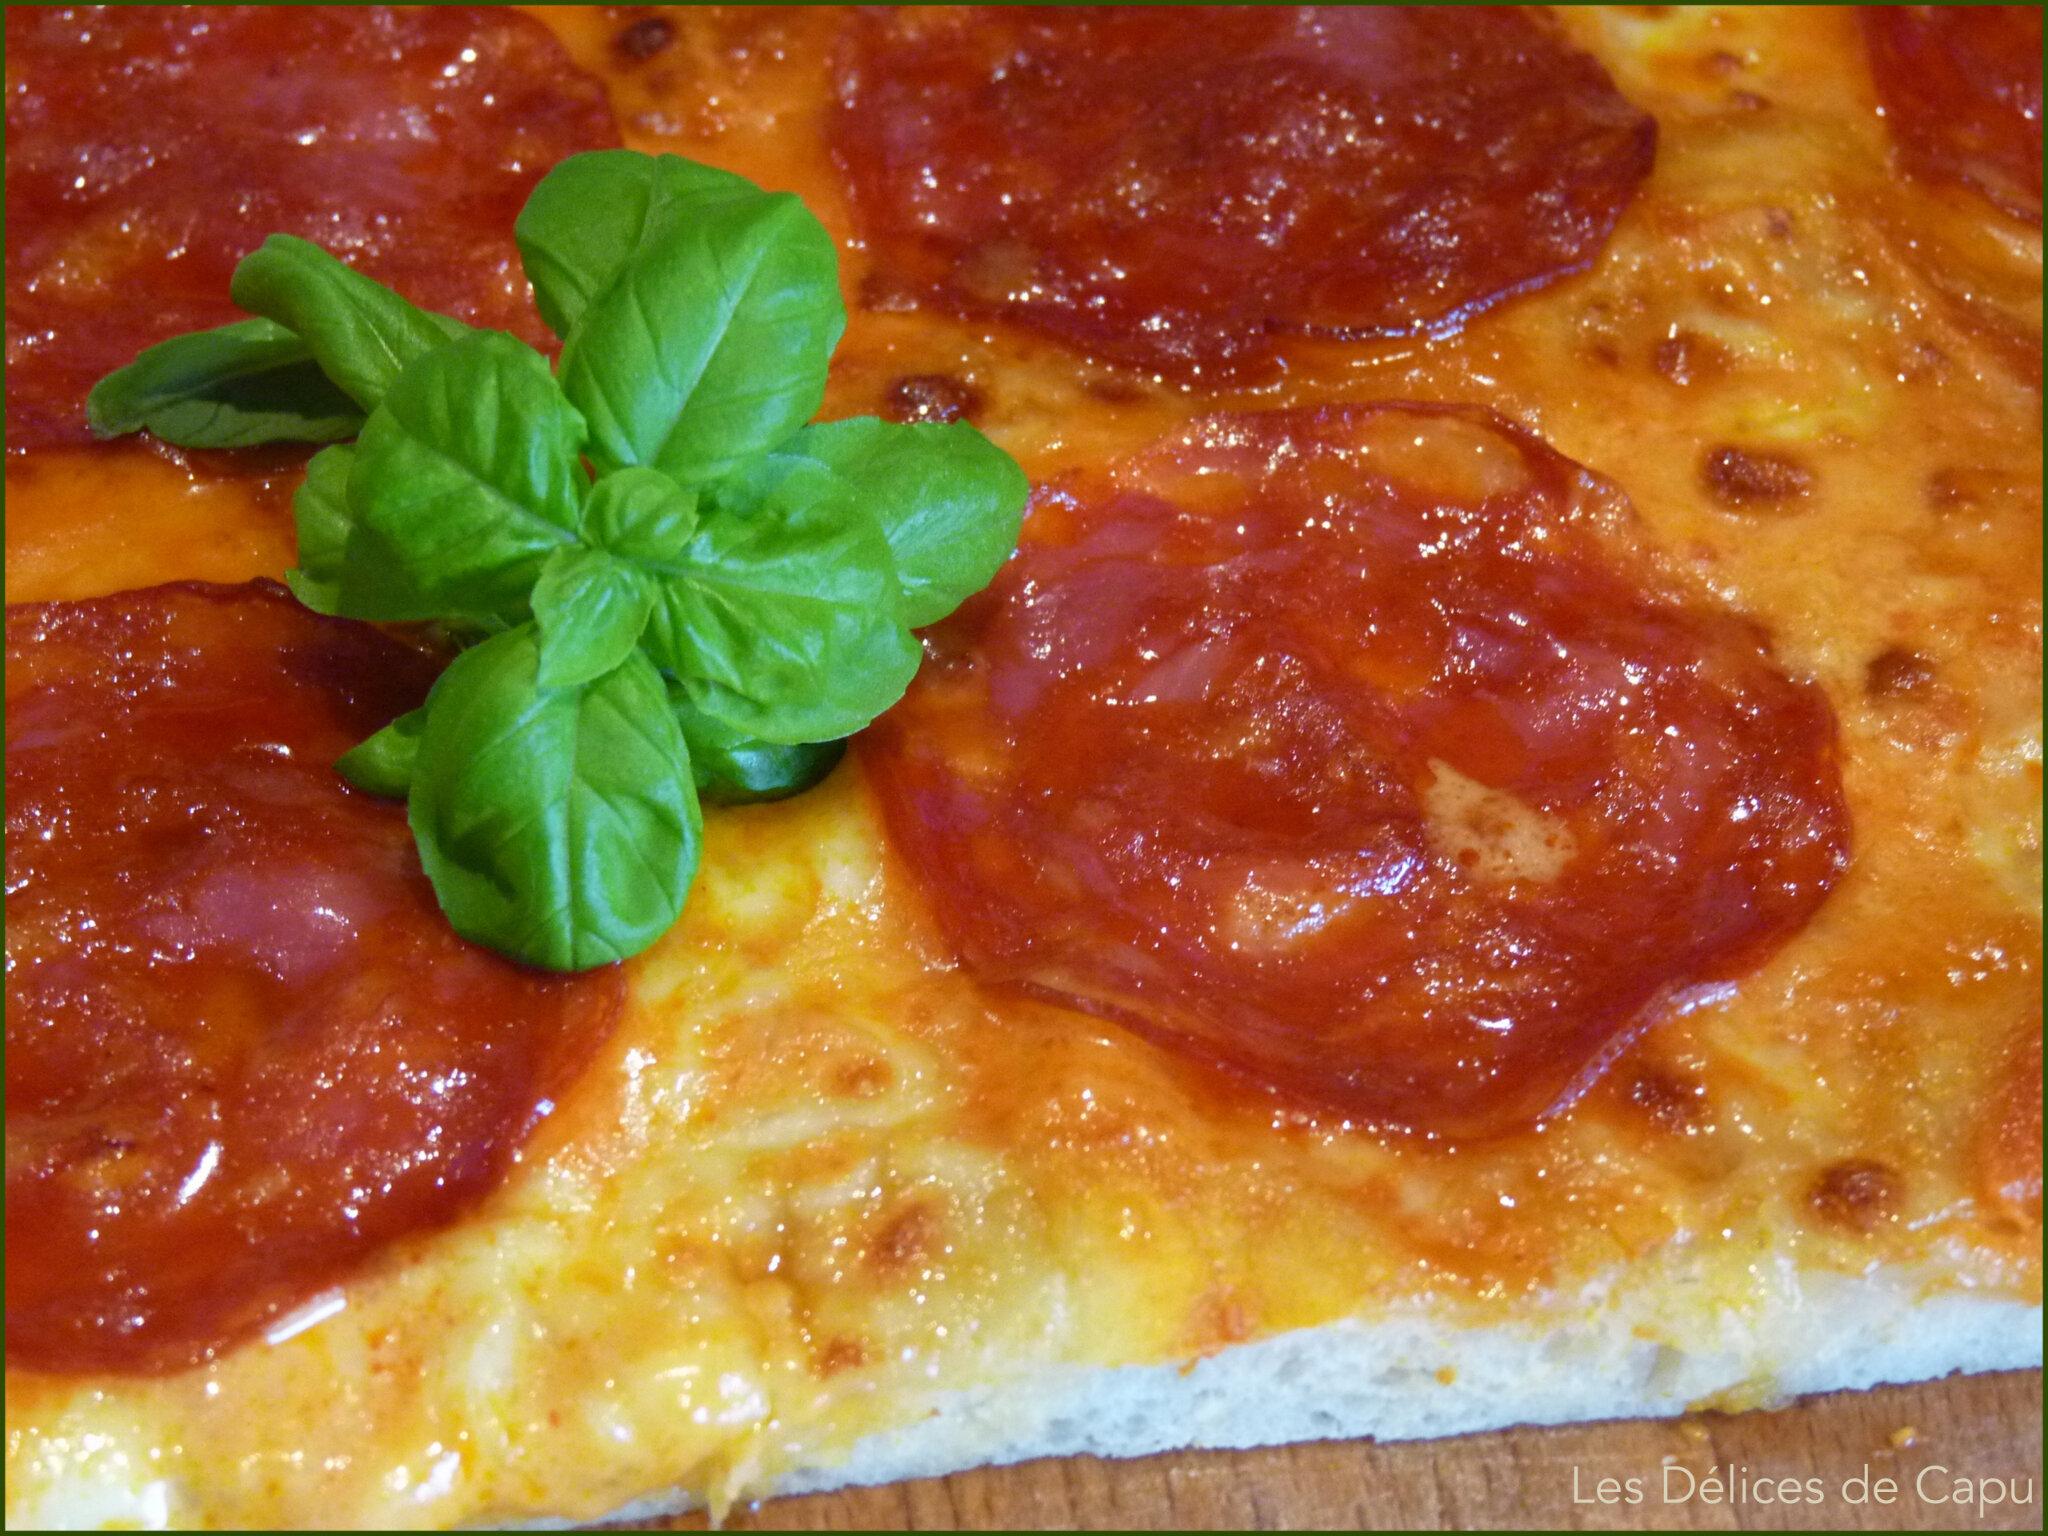 Pizza fonzarelli